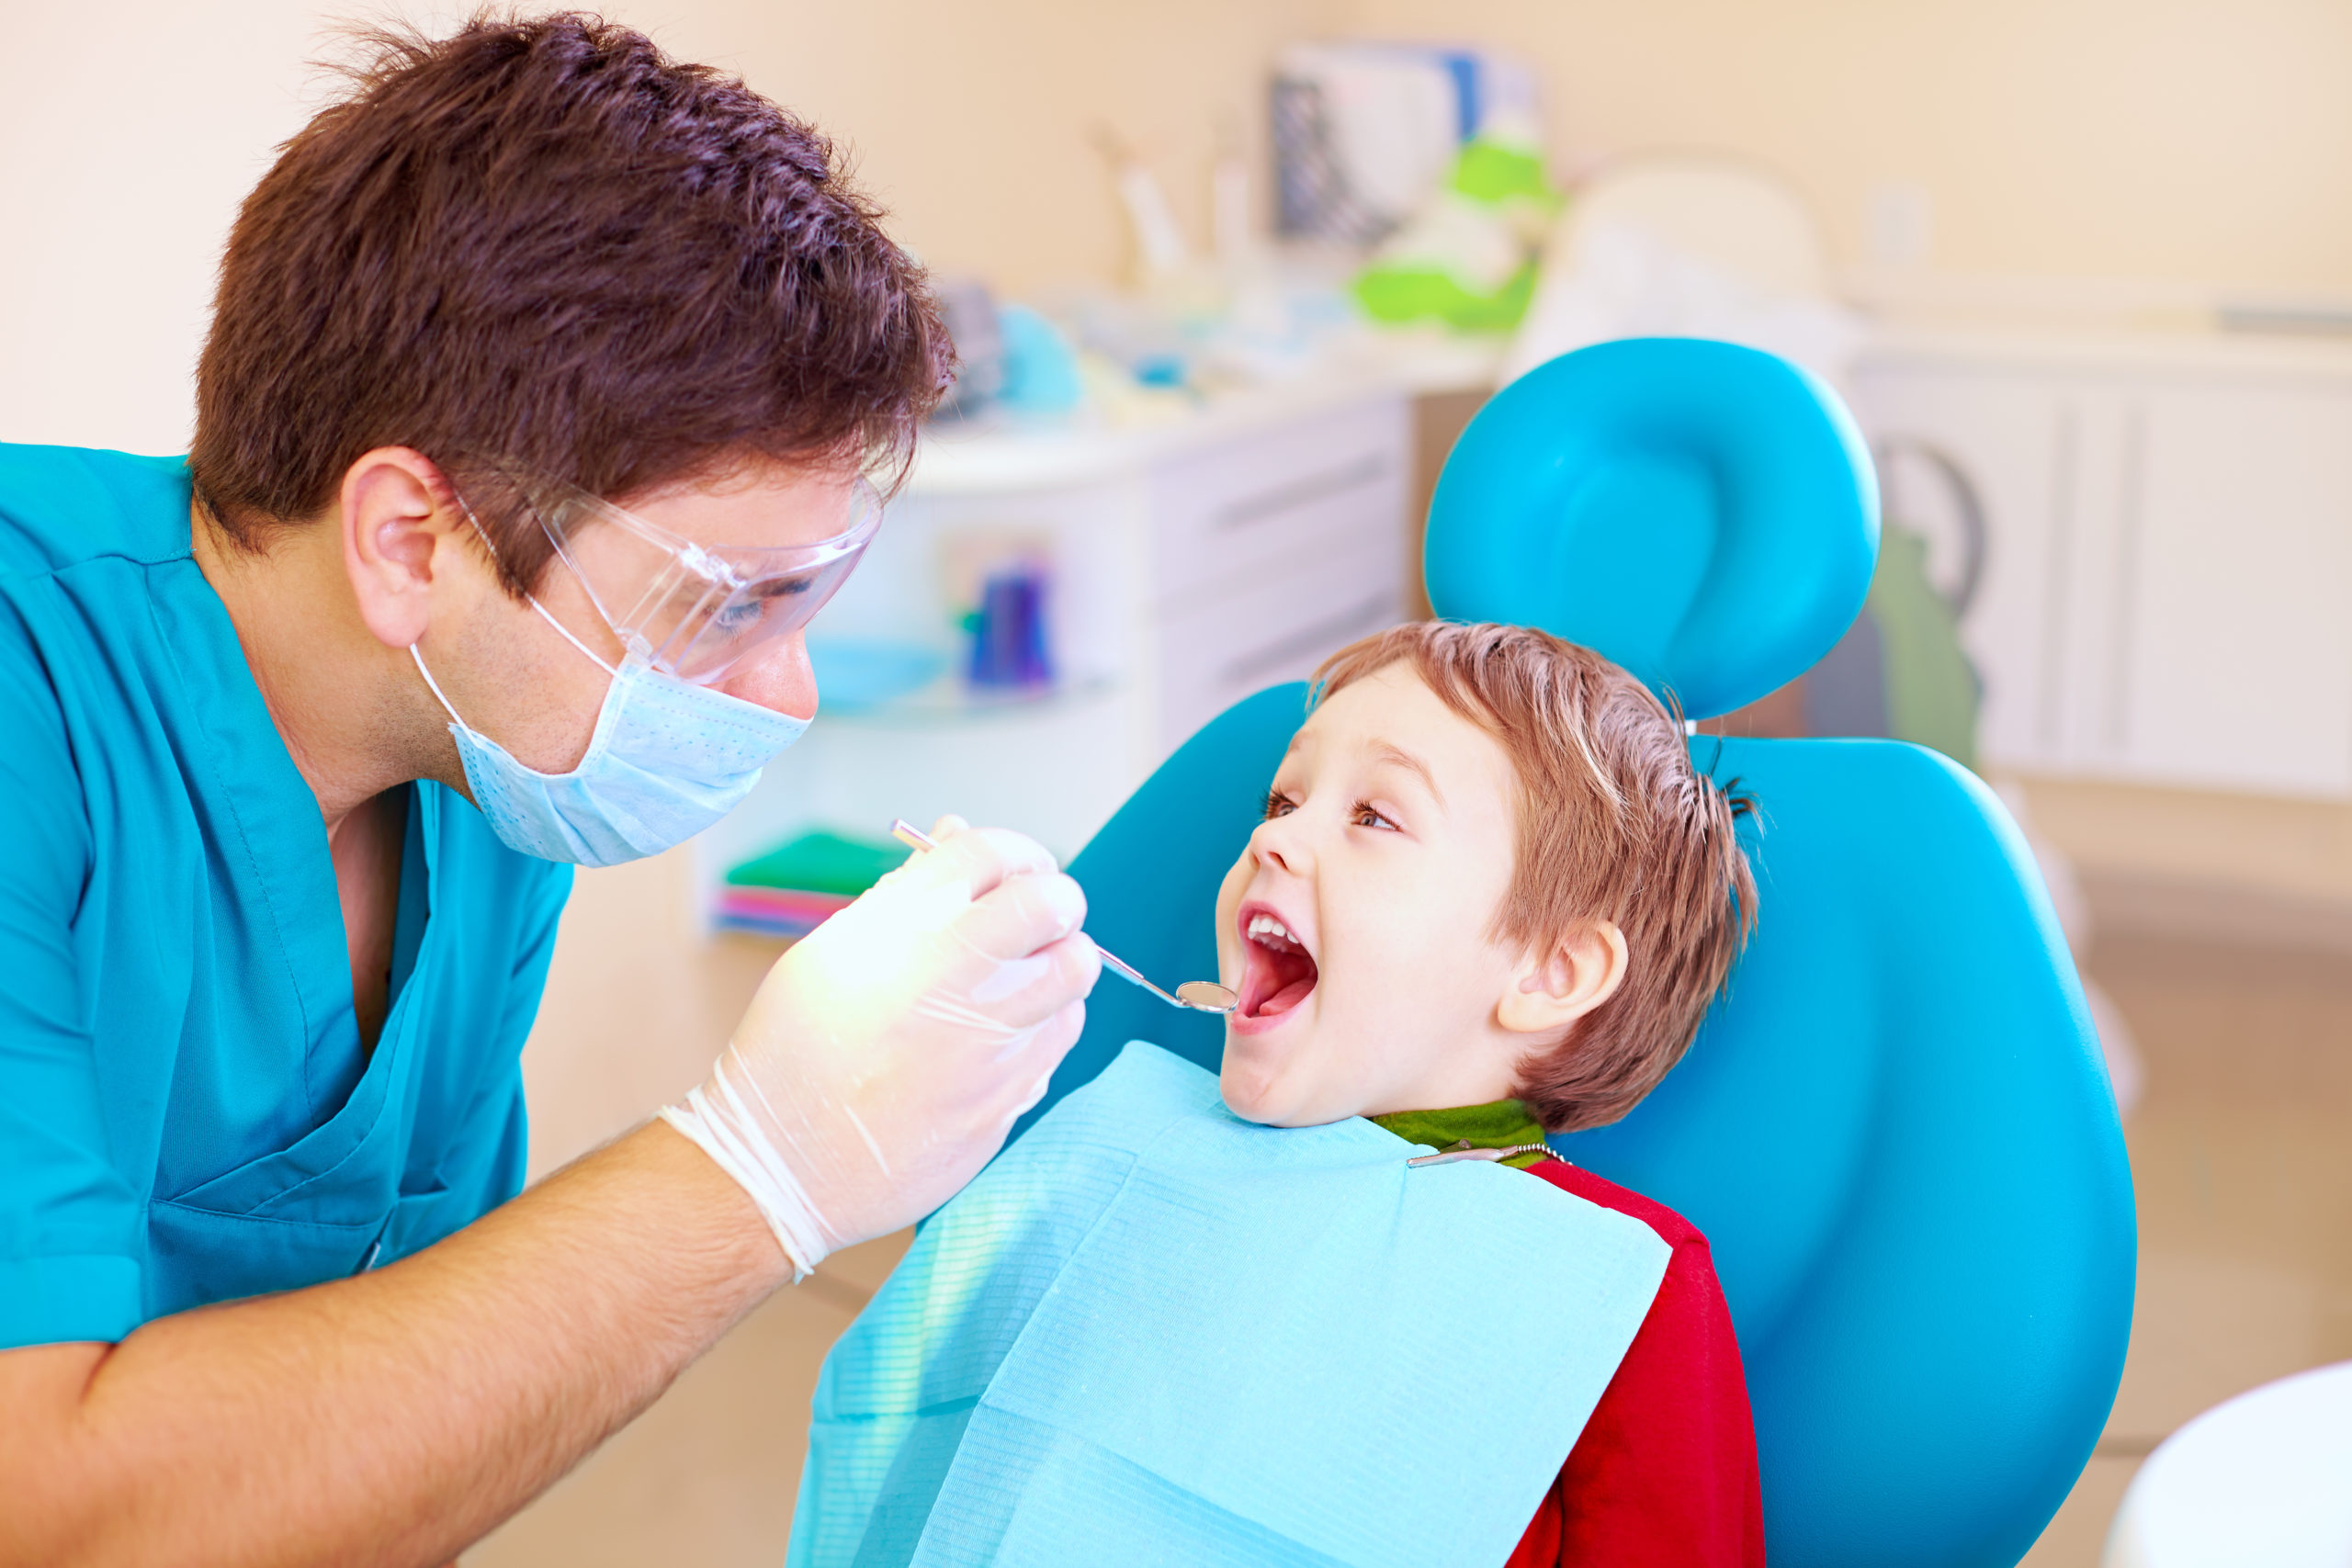 south calgary dentist giving a dental exam to a child